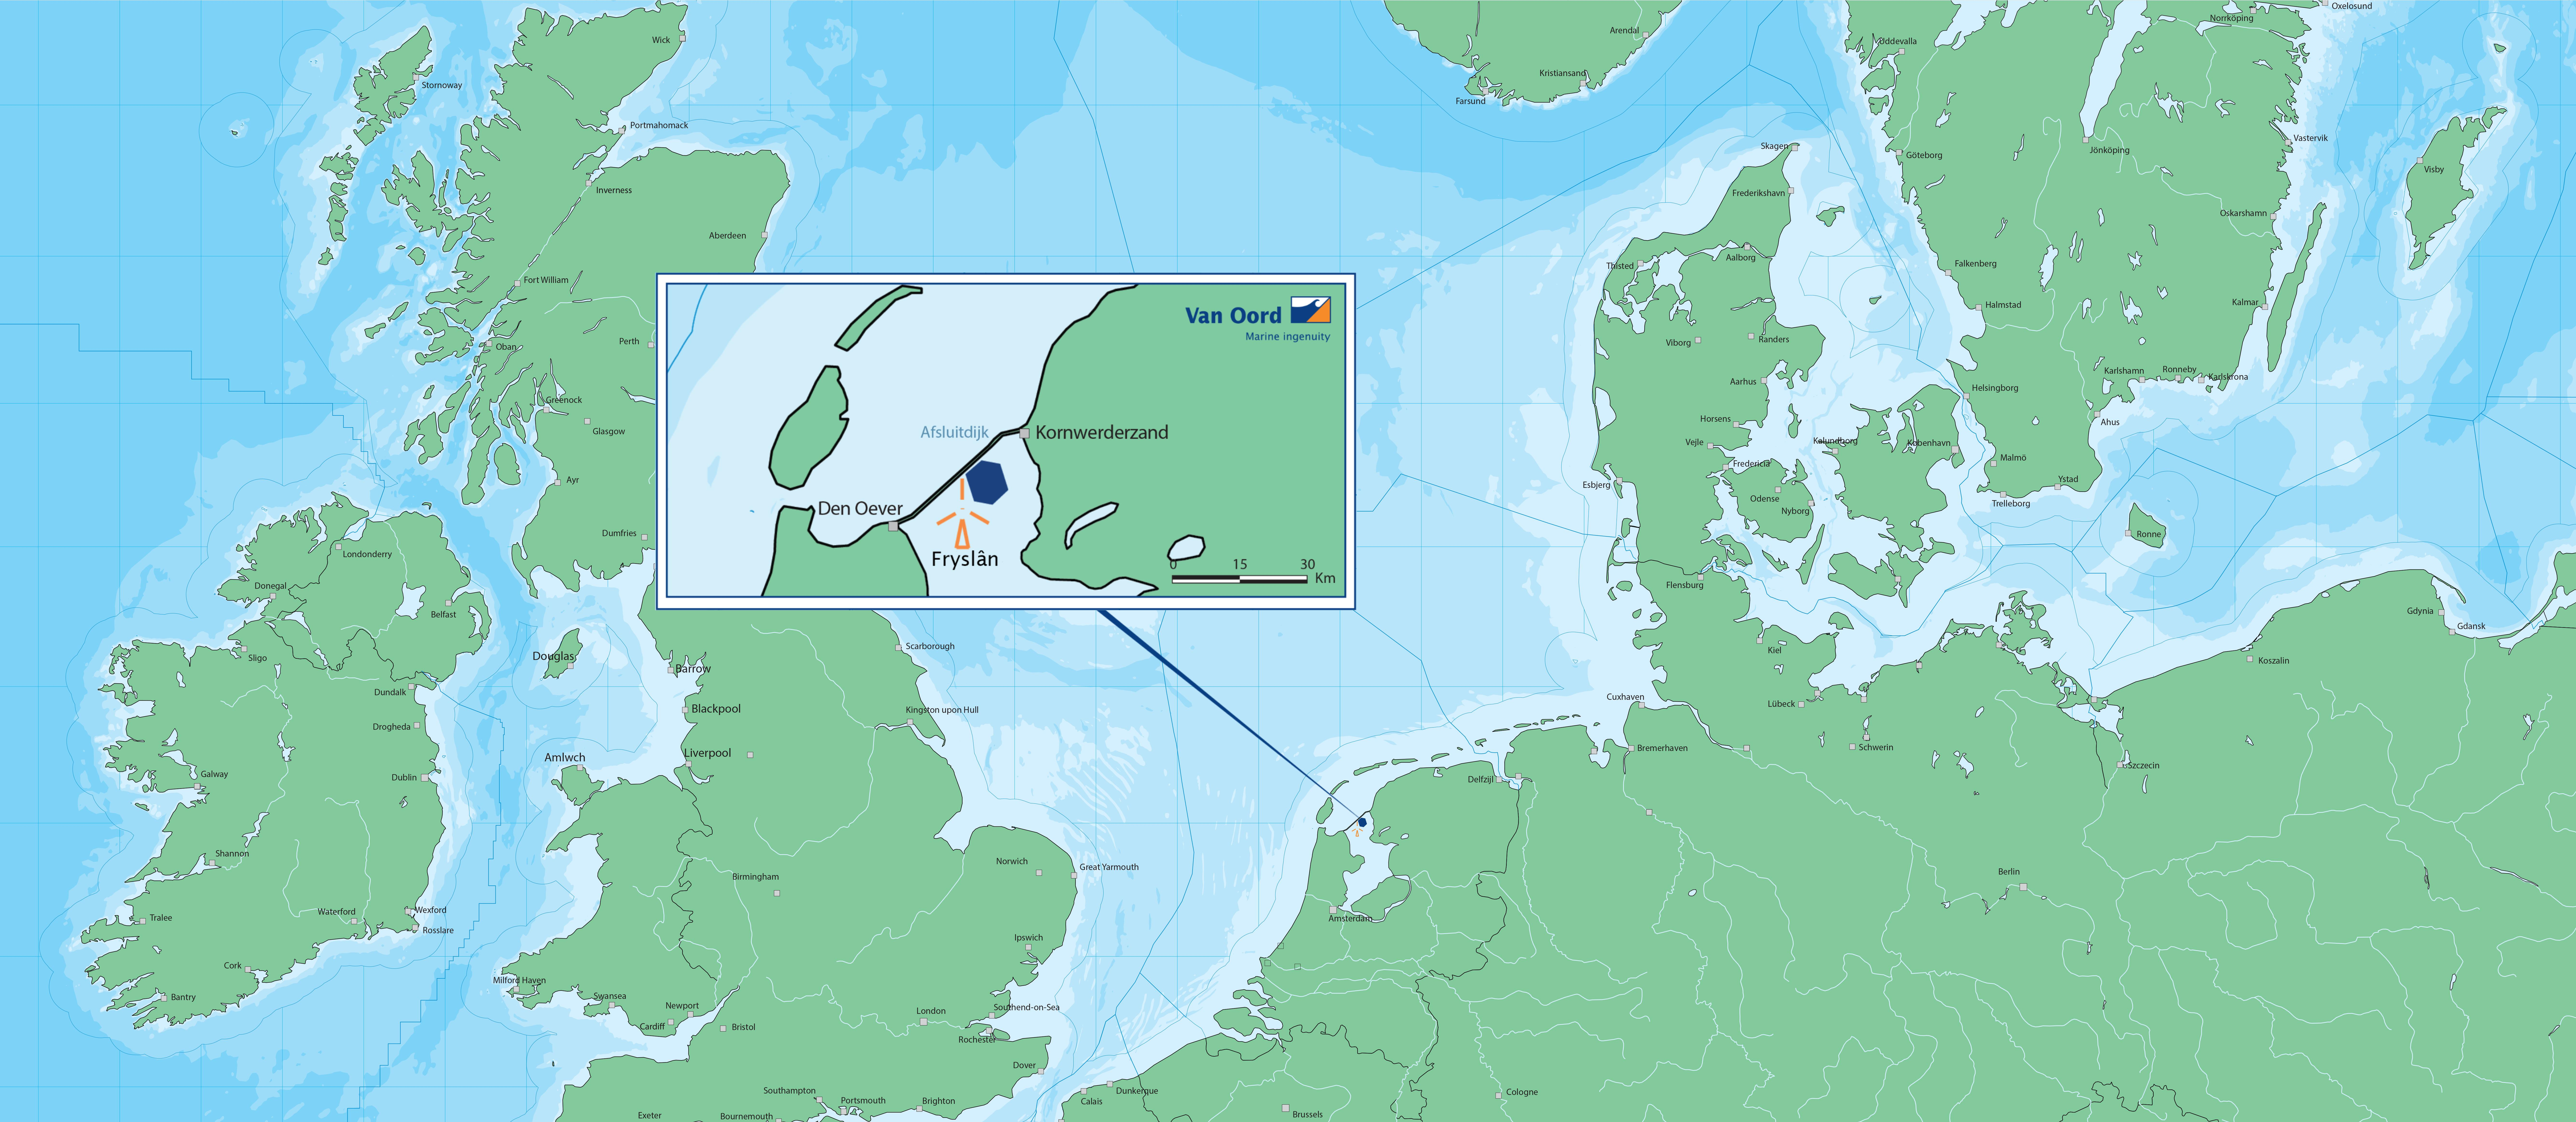 Windpark Fryslan – map